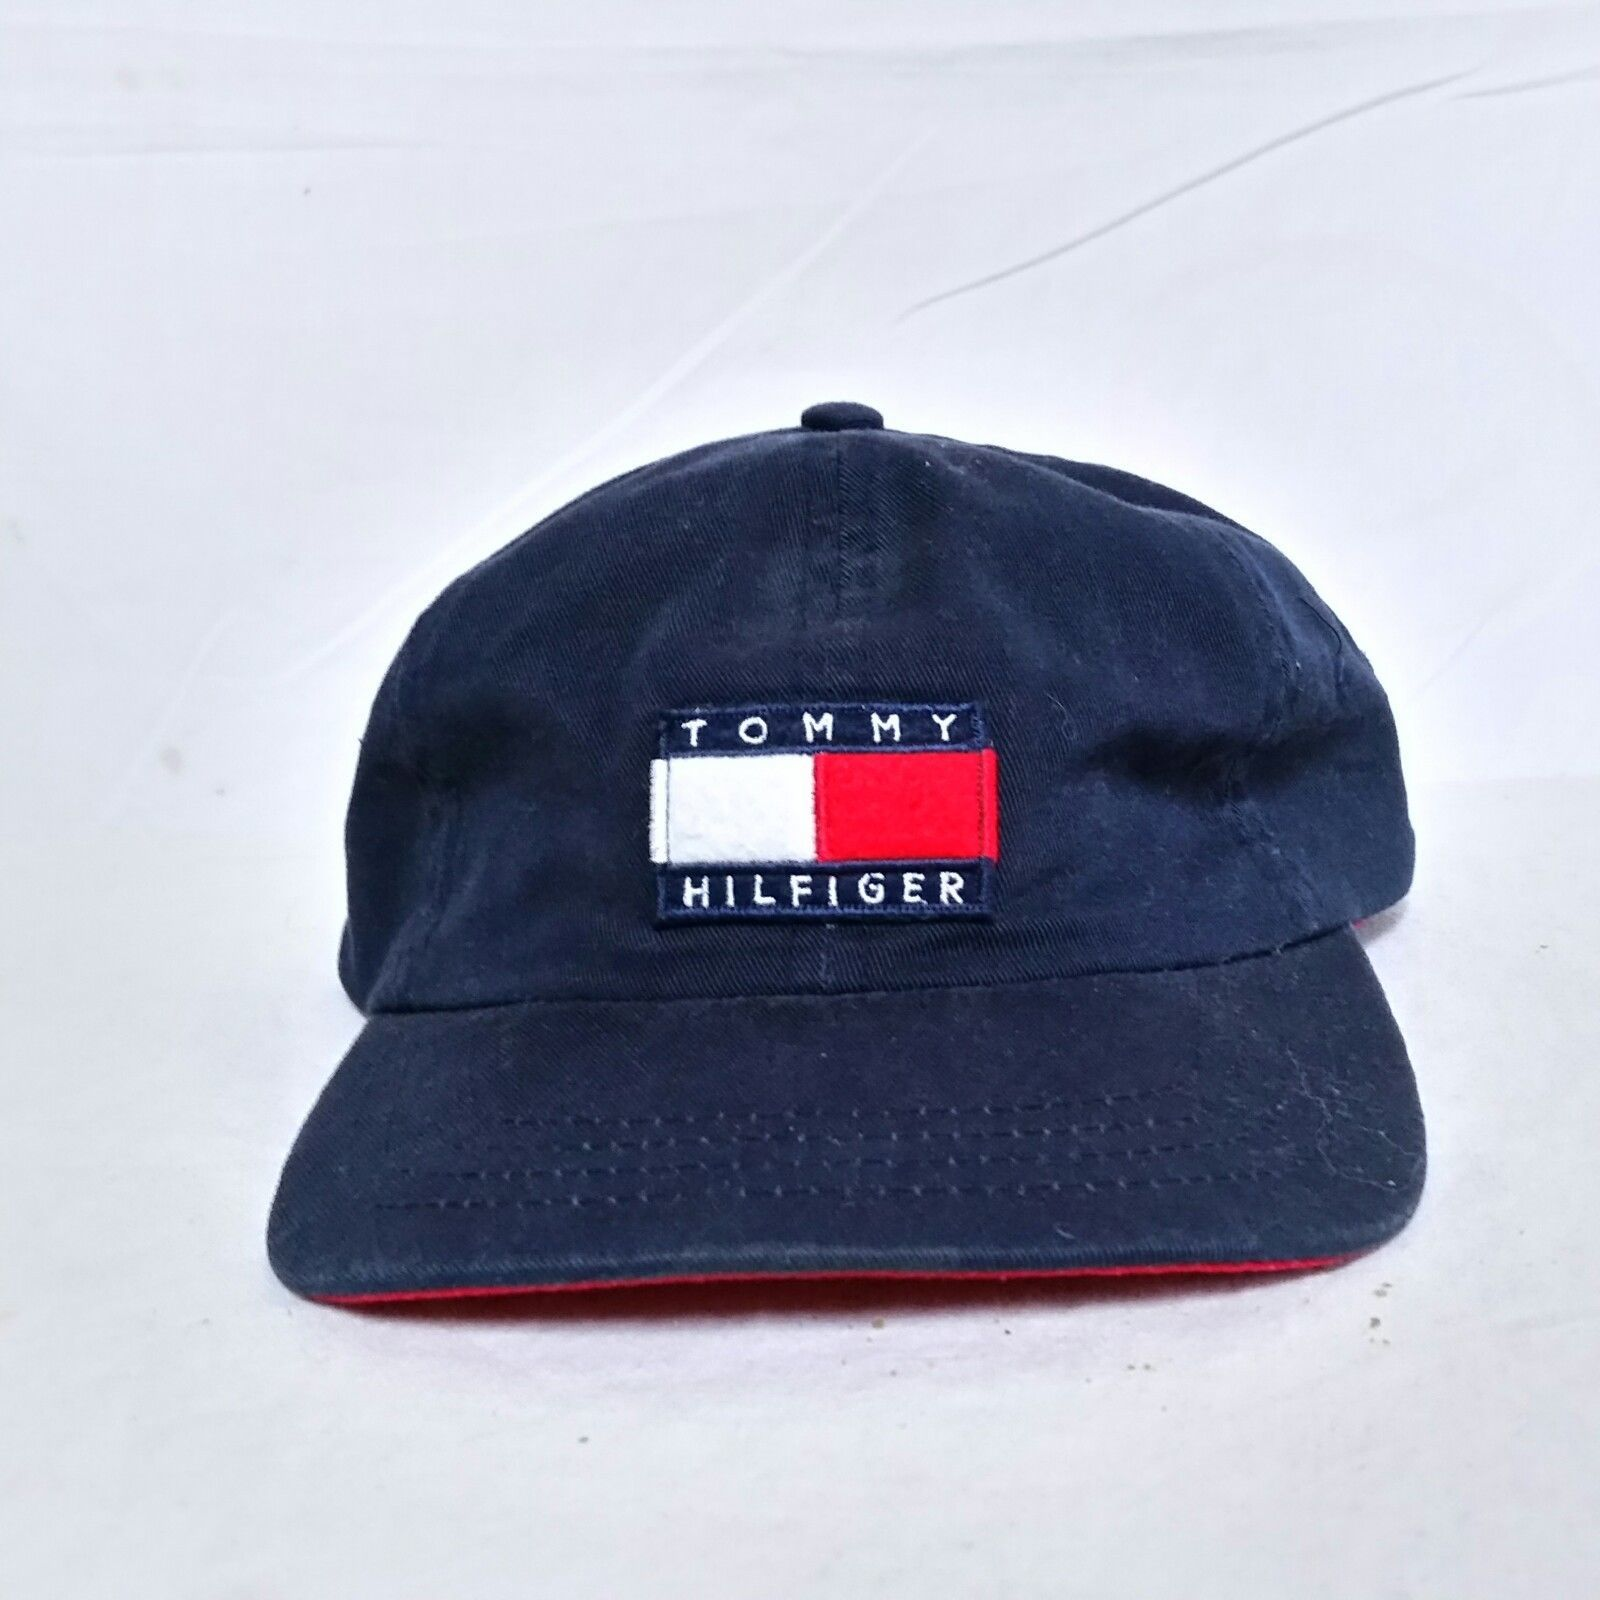 3abf4700e8e2 VTG Tommy Hilfiger Snapback Hat Flag 90s and 50 similar items